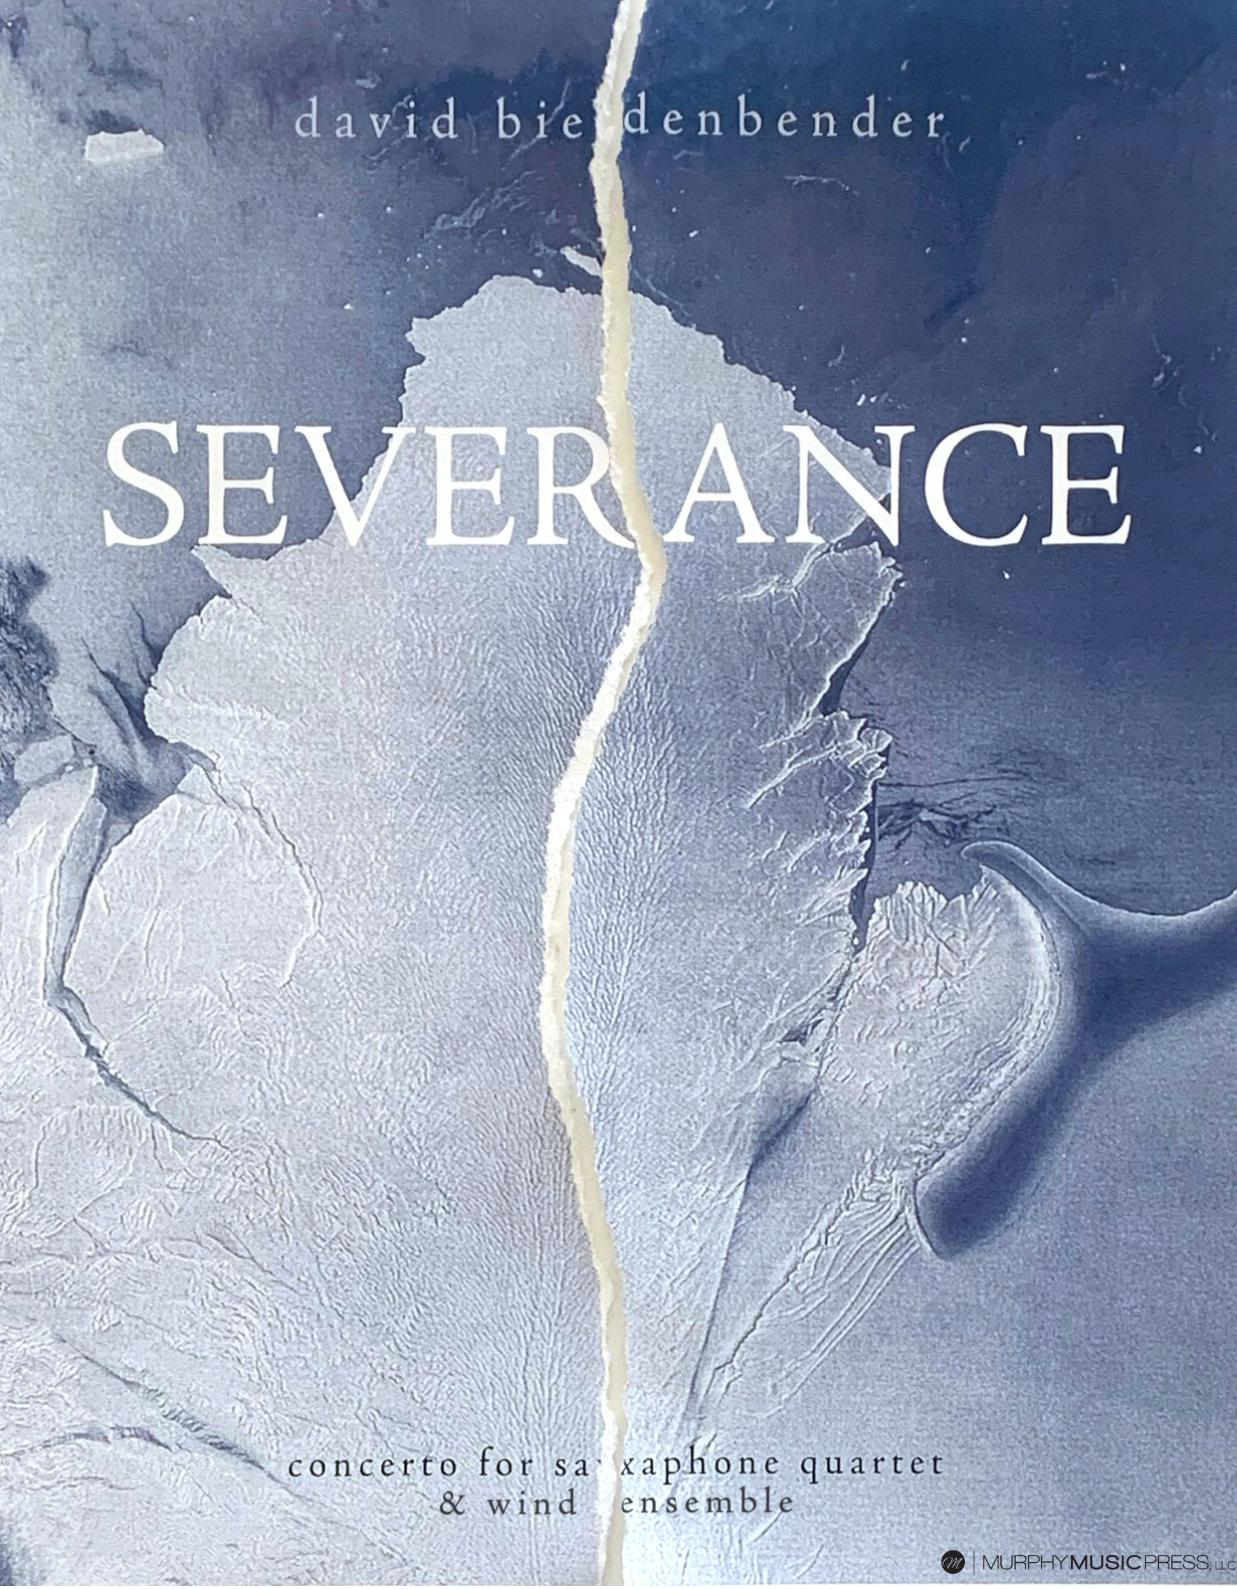 Severance (Score Only) by David Biedenbender